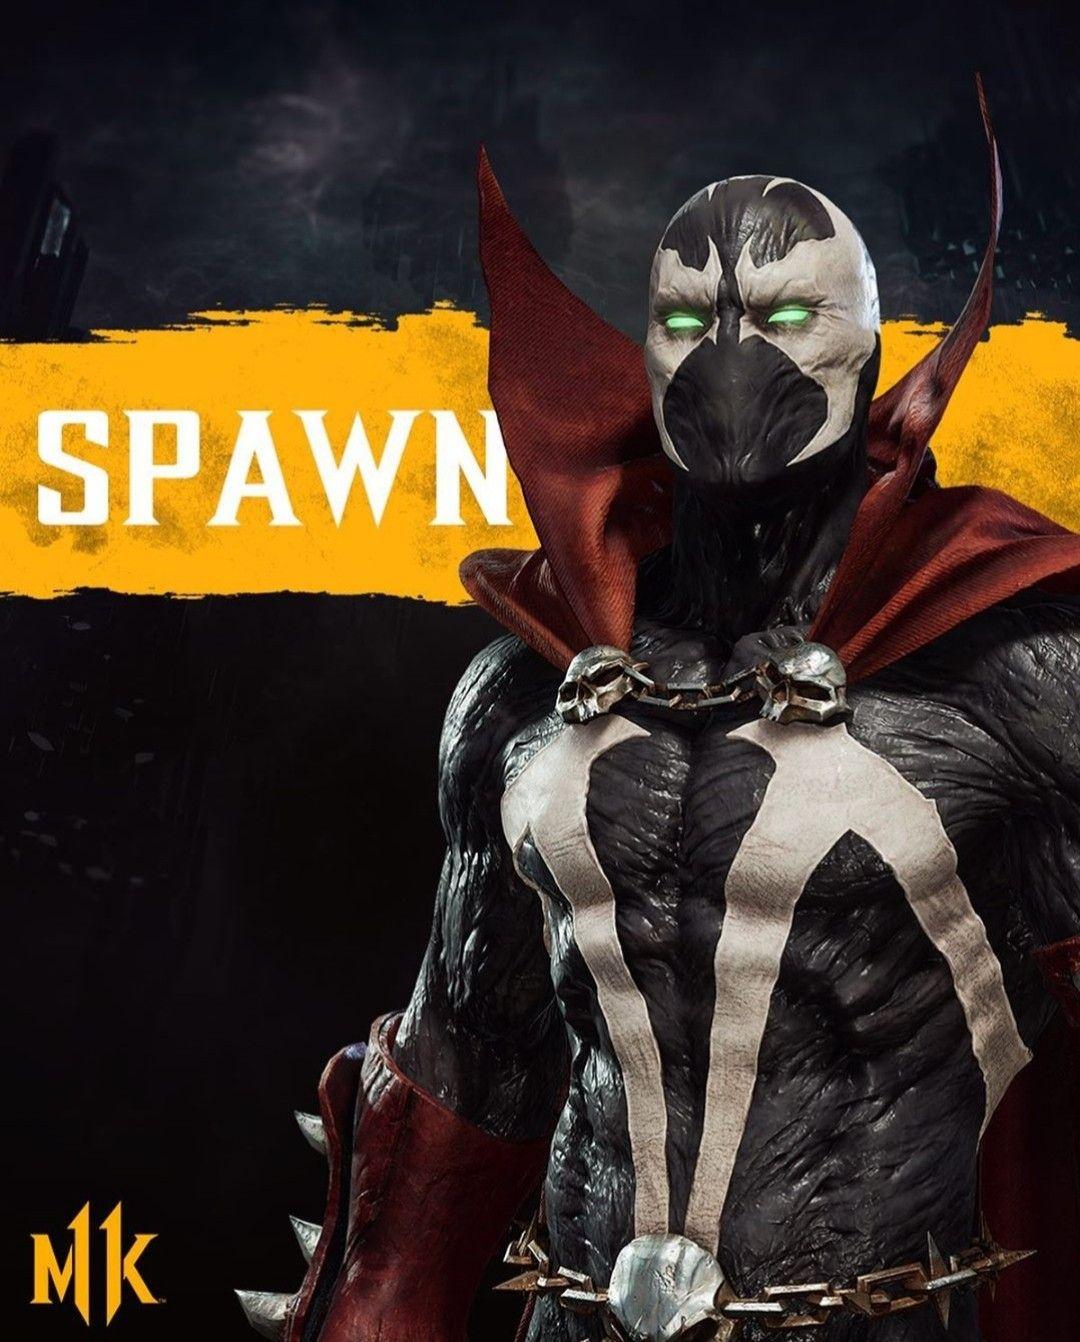 Pin By Fertwo Knight On Mk 11 Spawn Comics Spawn Mortal Kombat